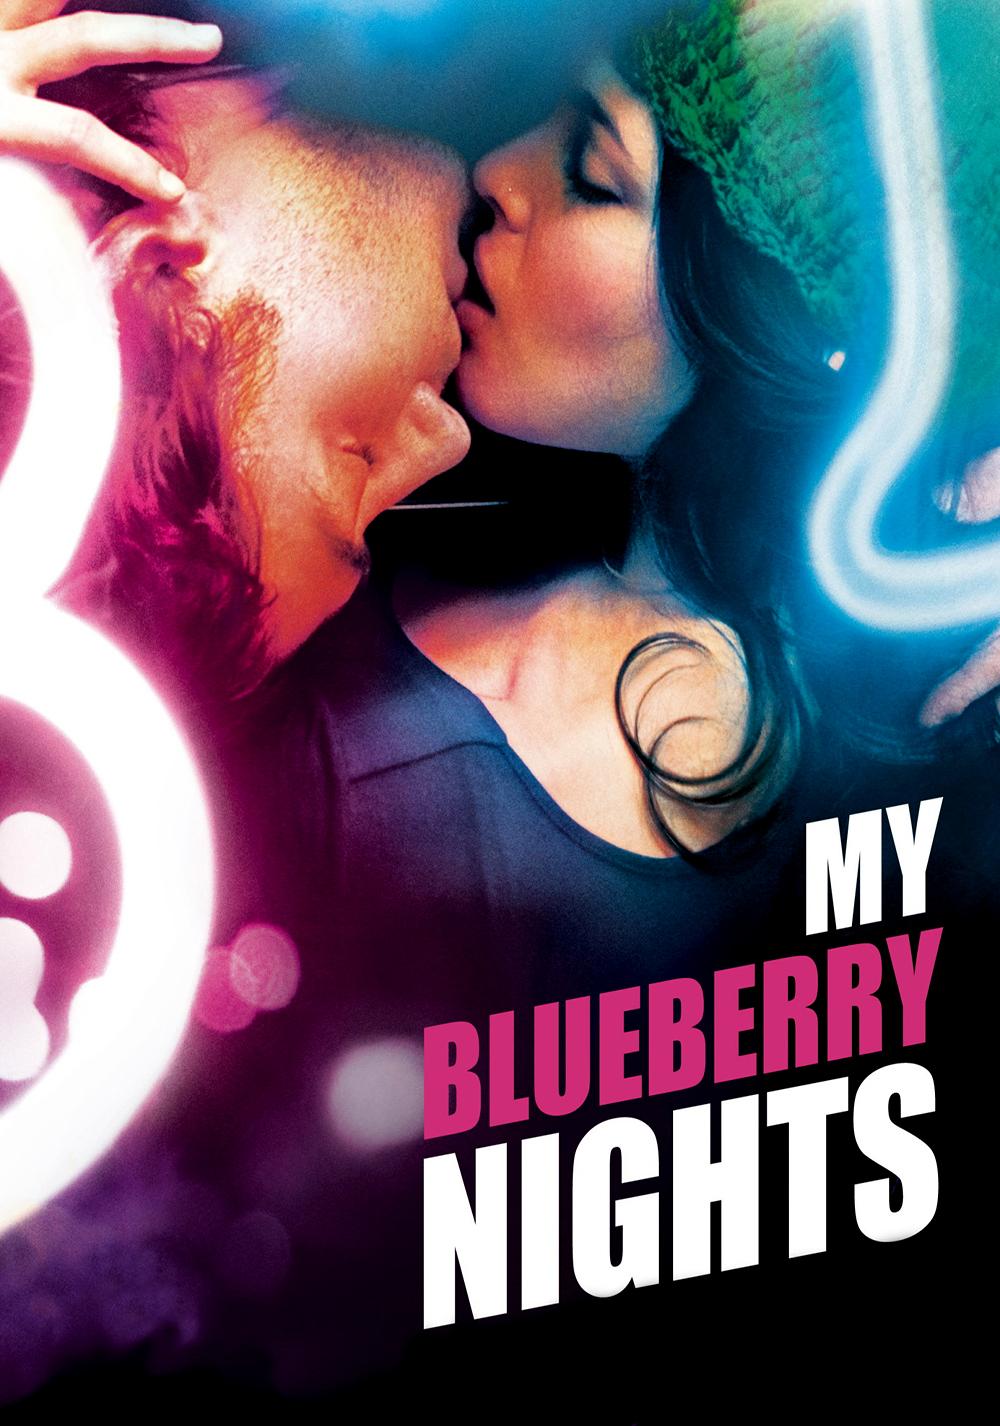 my-blueberry-nights-55874aef8be40.jpg